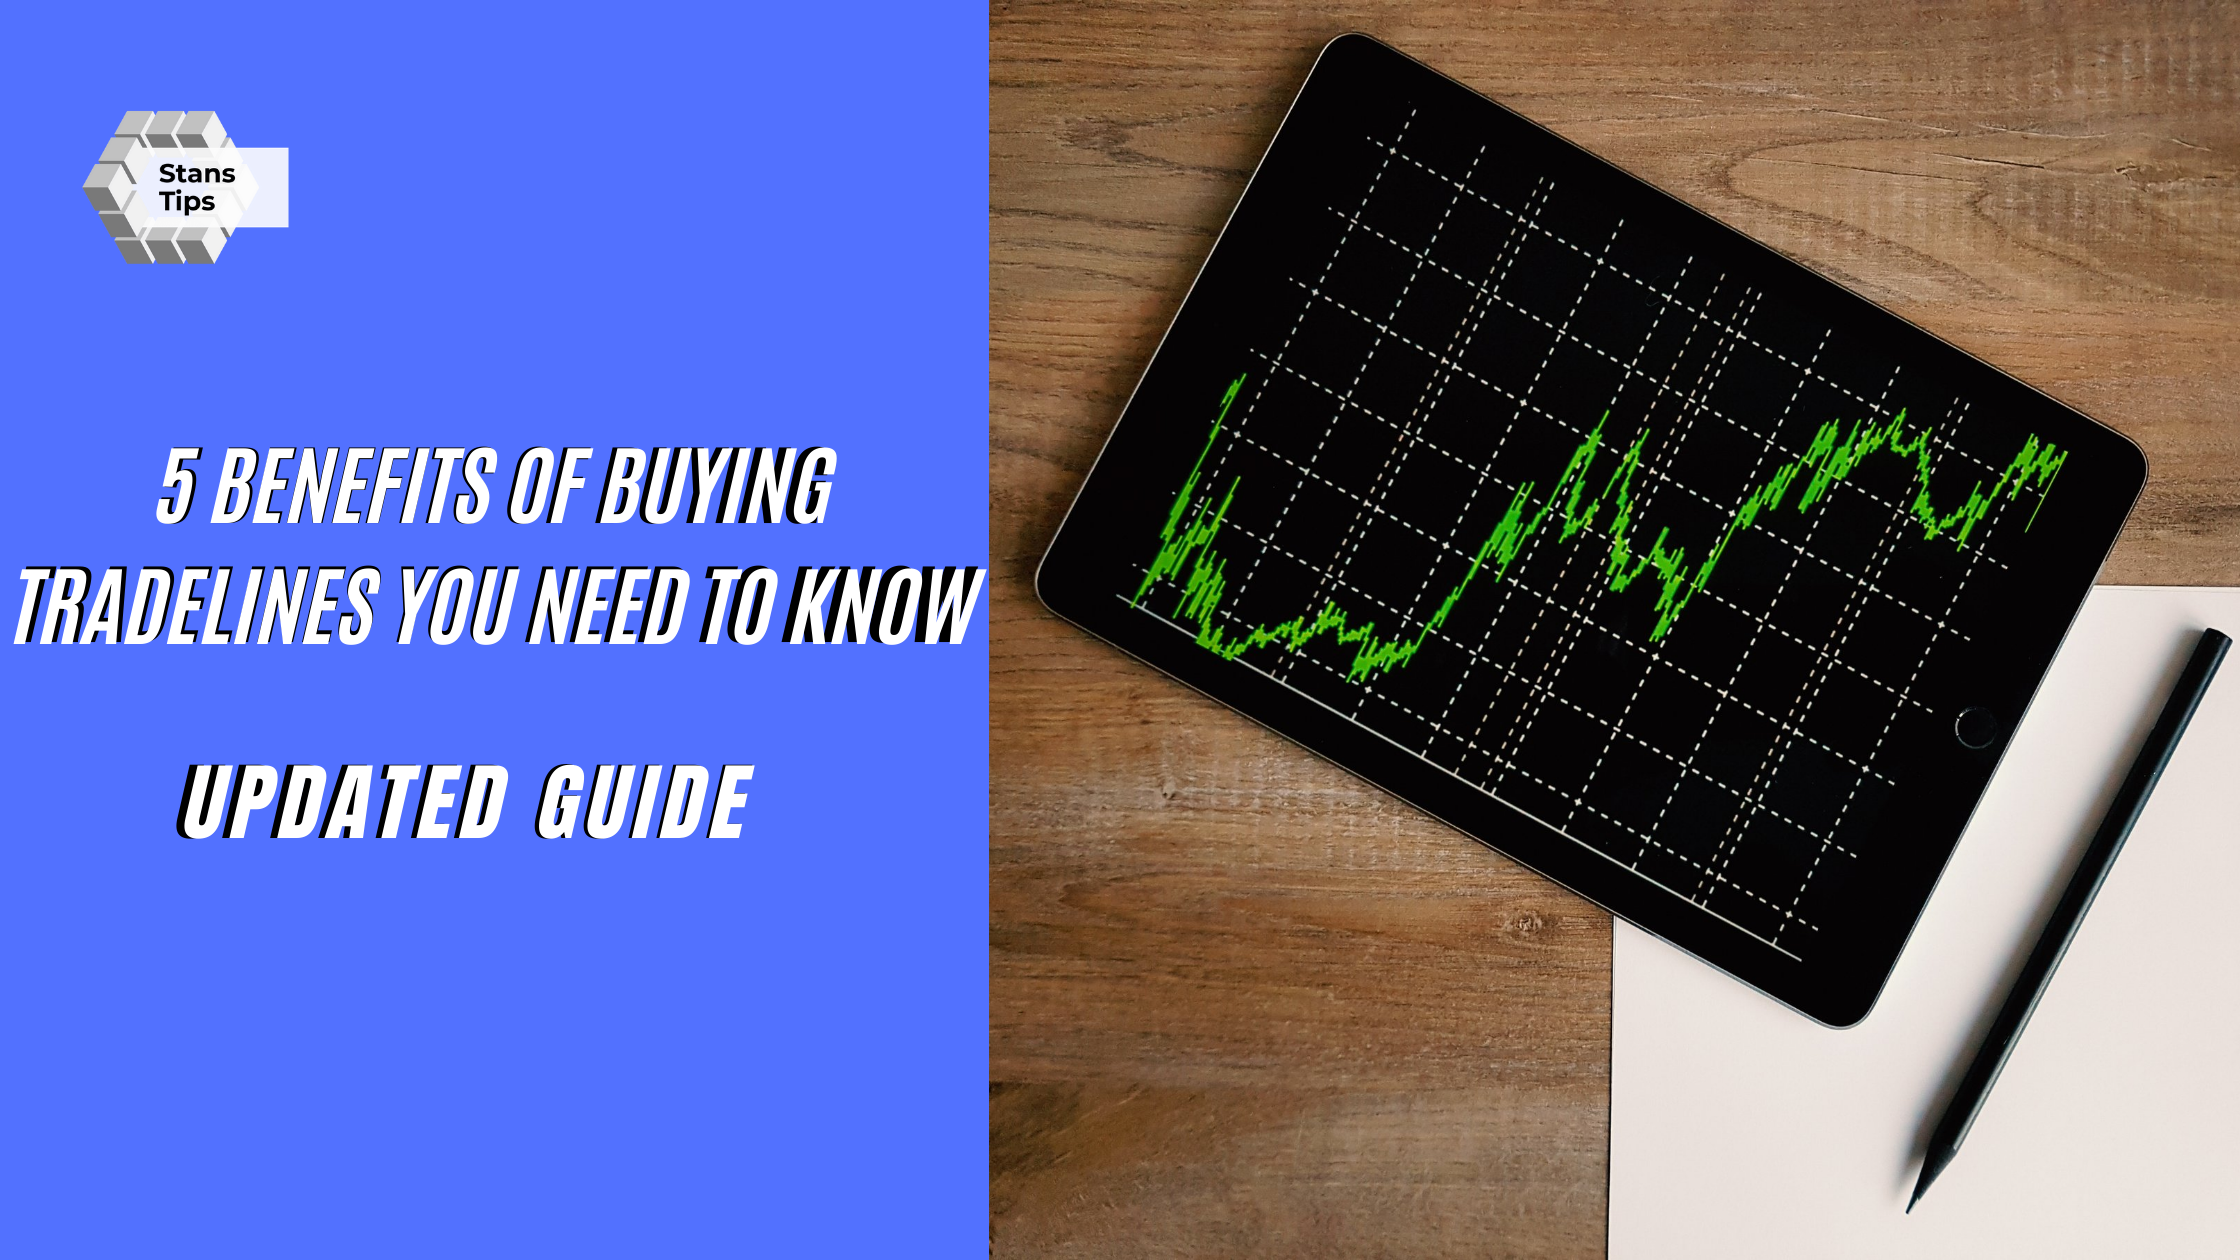 Benefits of buying tradelines